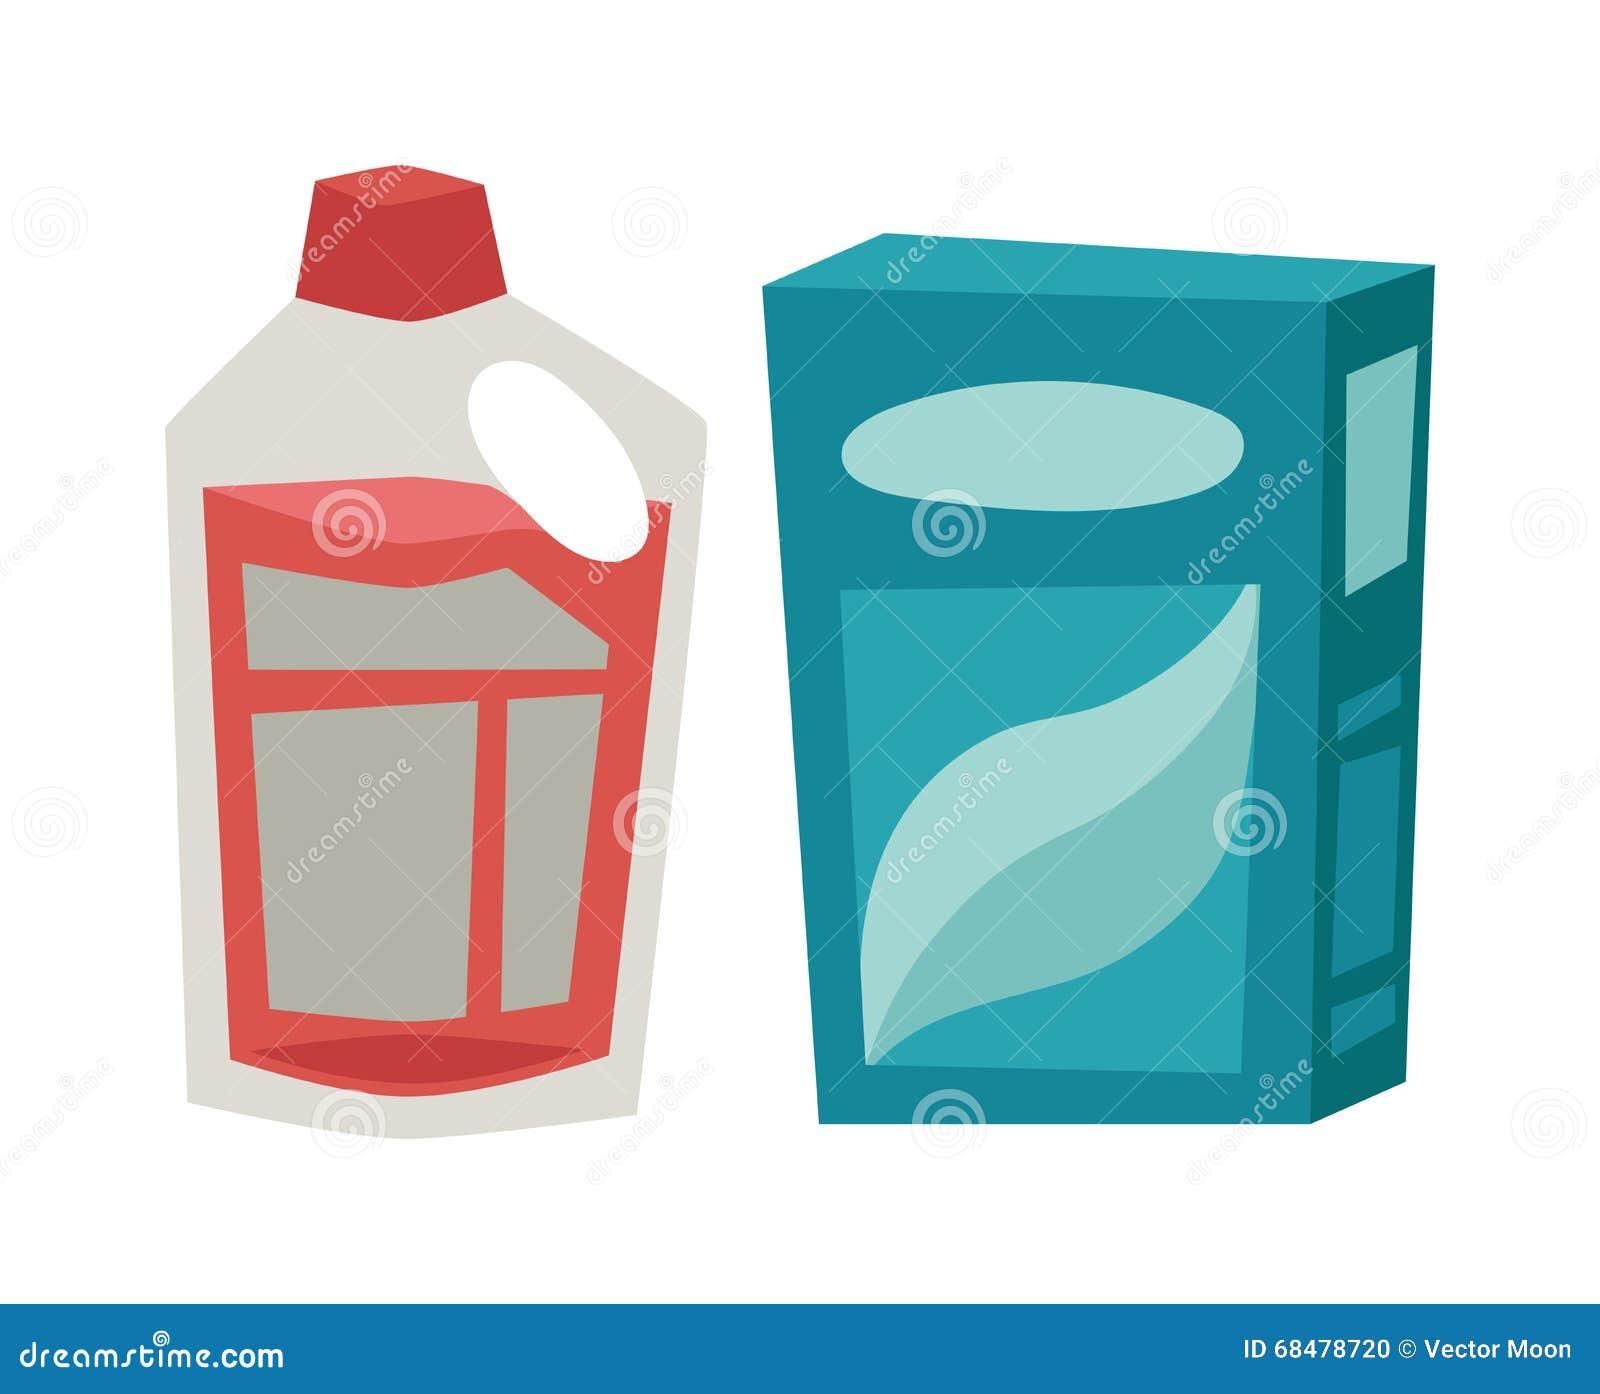 Laundry Detergent Box Clipart White laundry detergent powder container ...